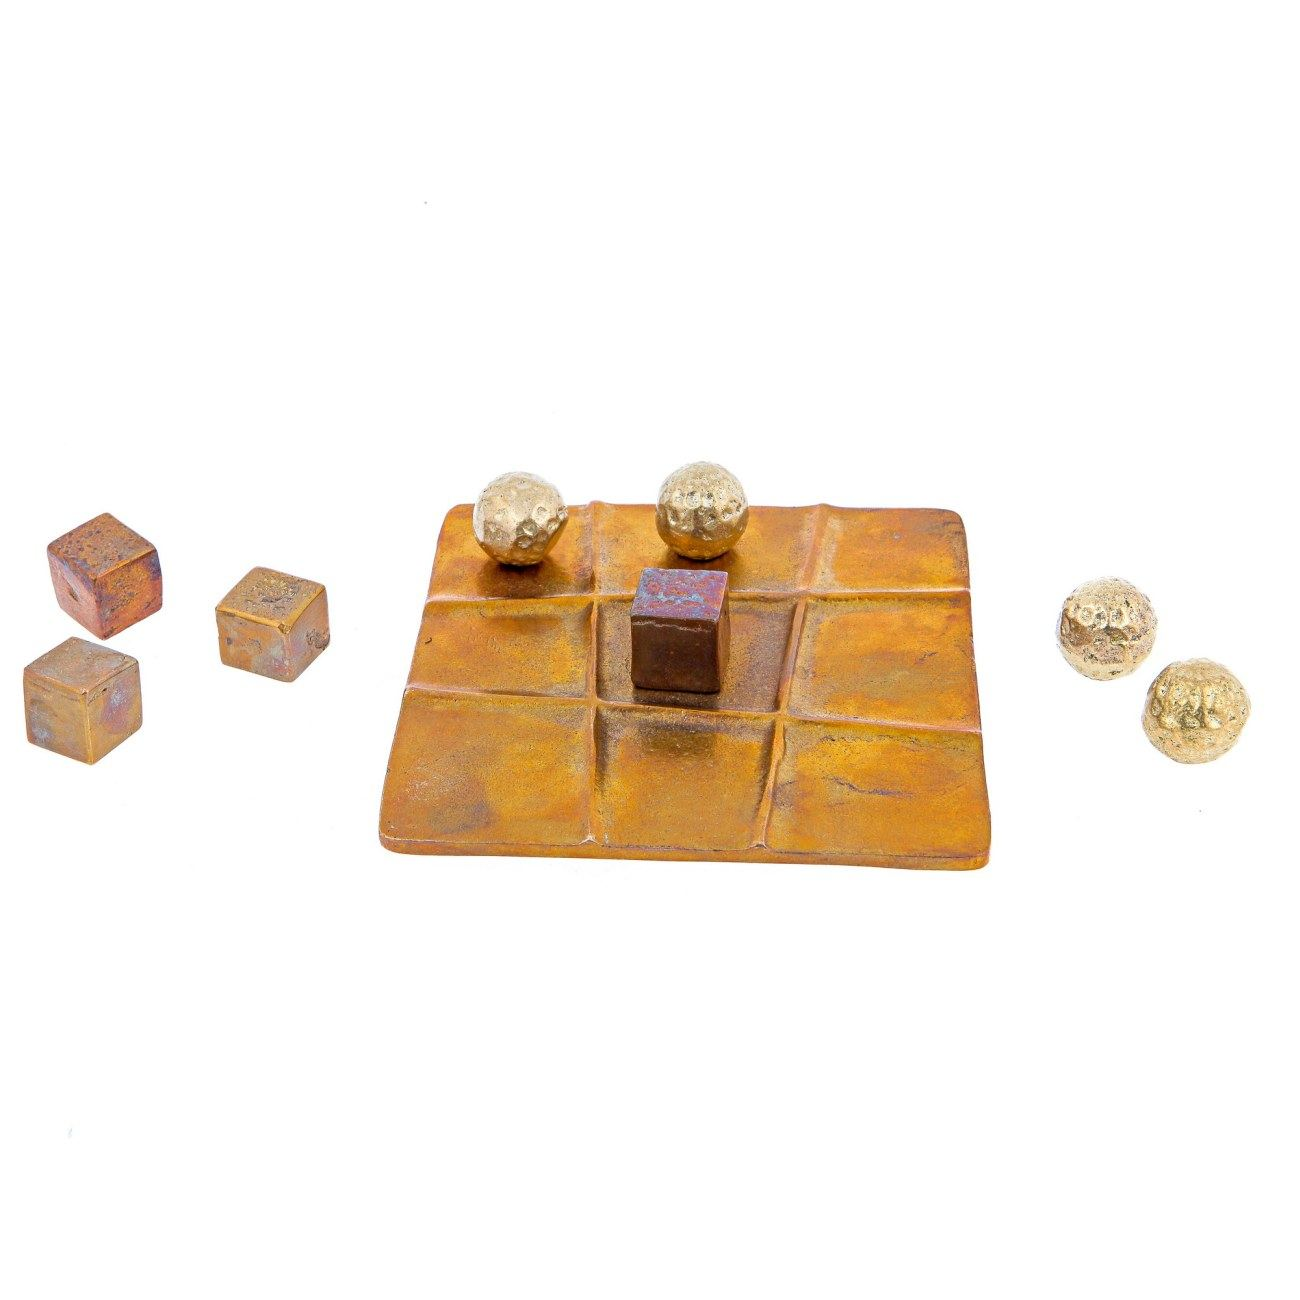 Decorative Product Board : Tic tac toe decorative board game handmade bronze metal